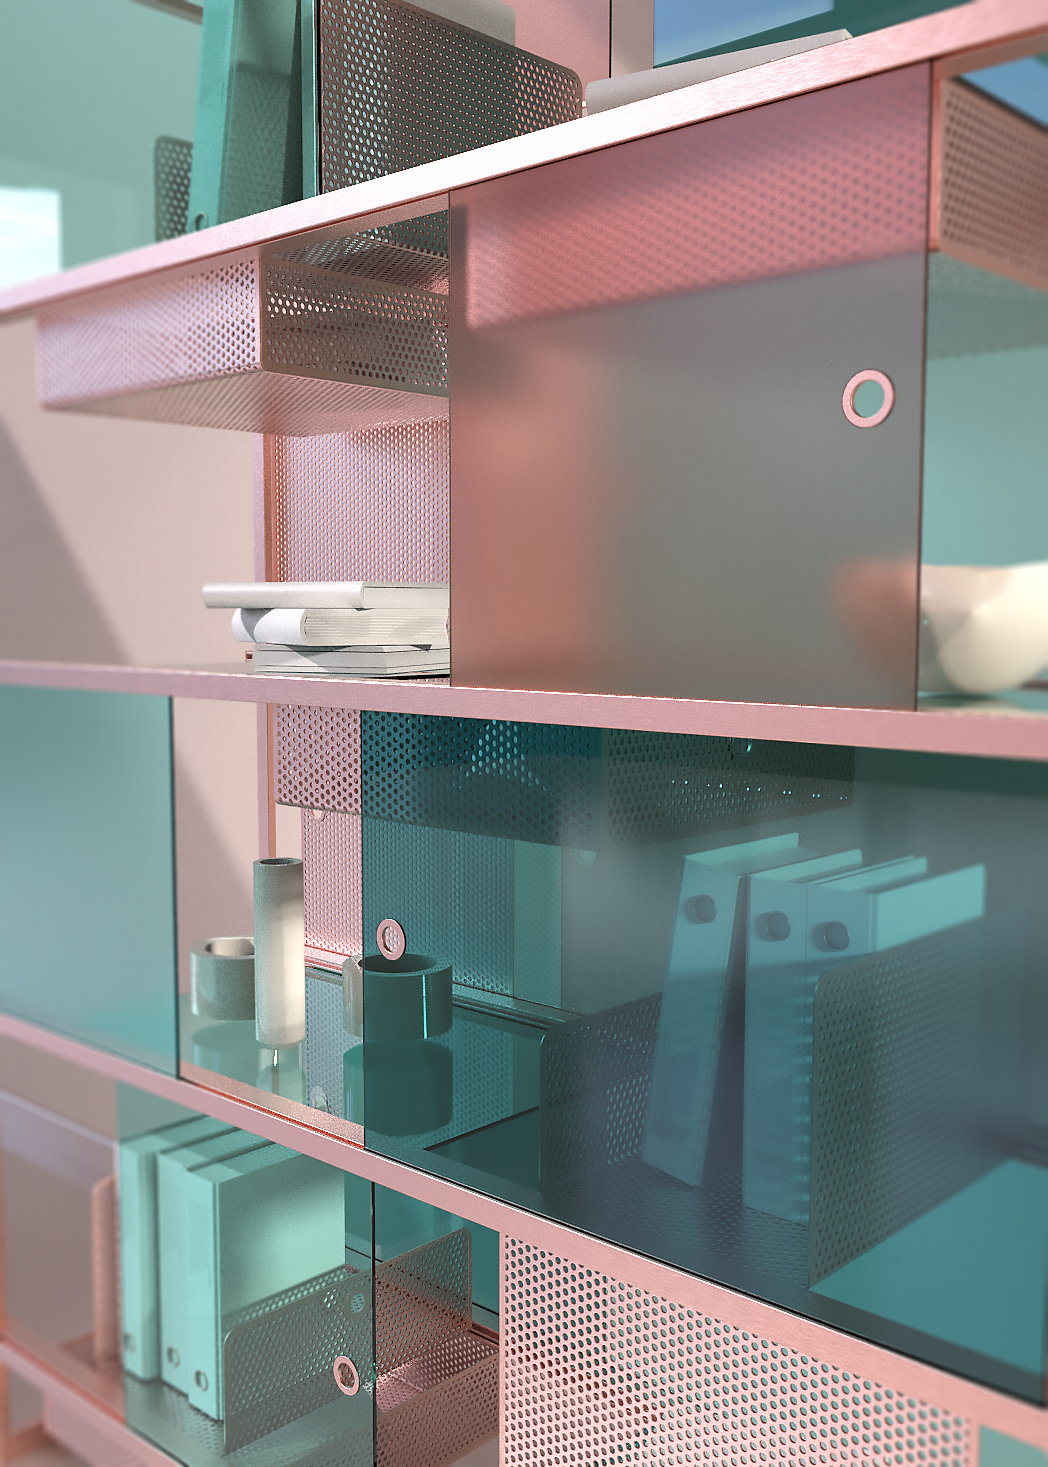 wanderlust_cabinet_adventurer_roze_modular_leandra-eibl_ventura_salone_del_mobile_milan_design_week3_.png